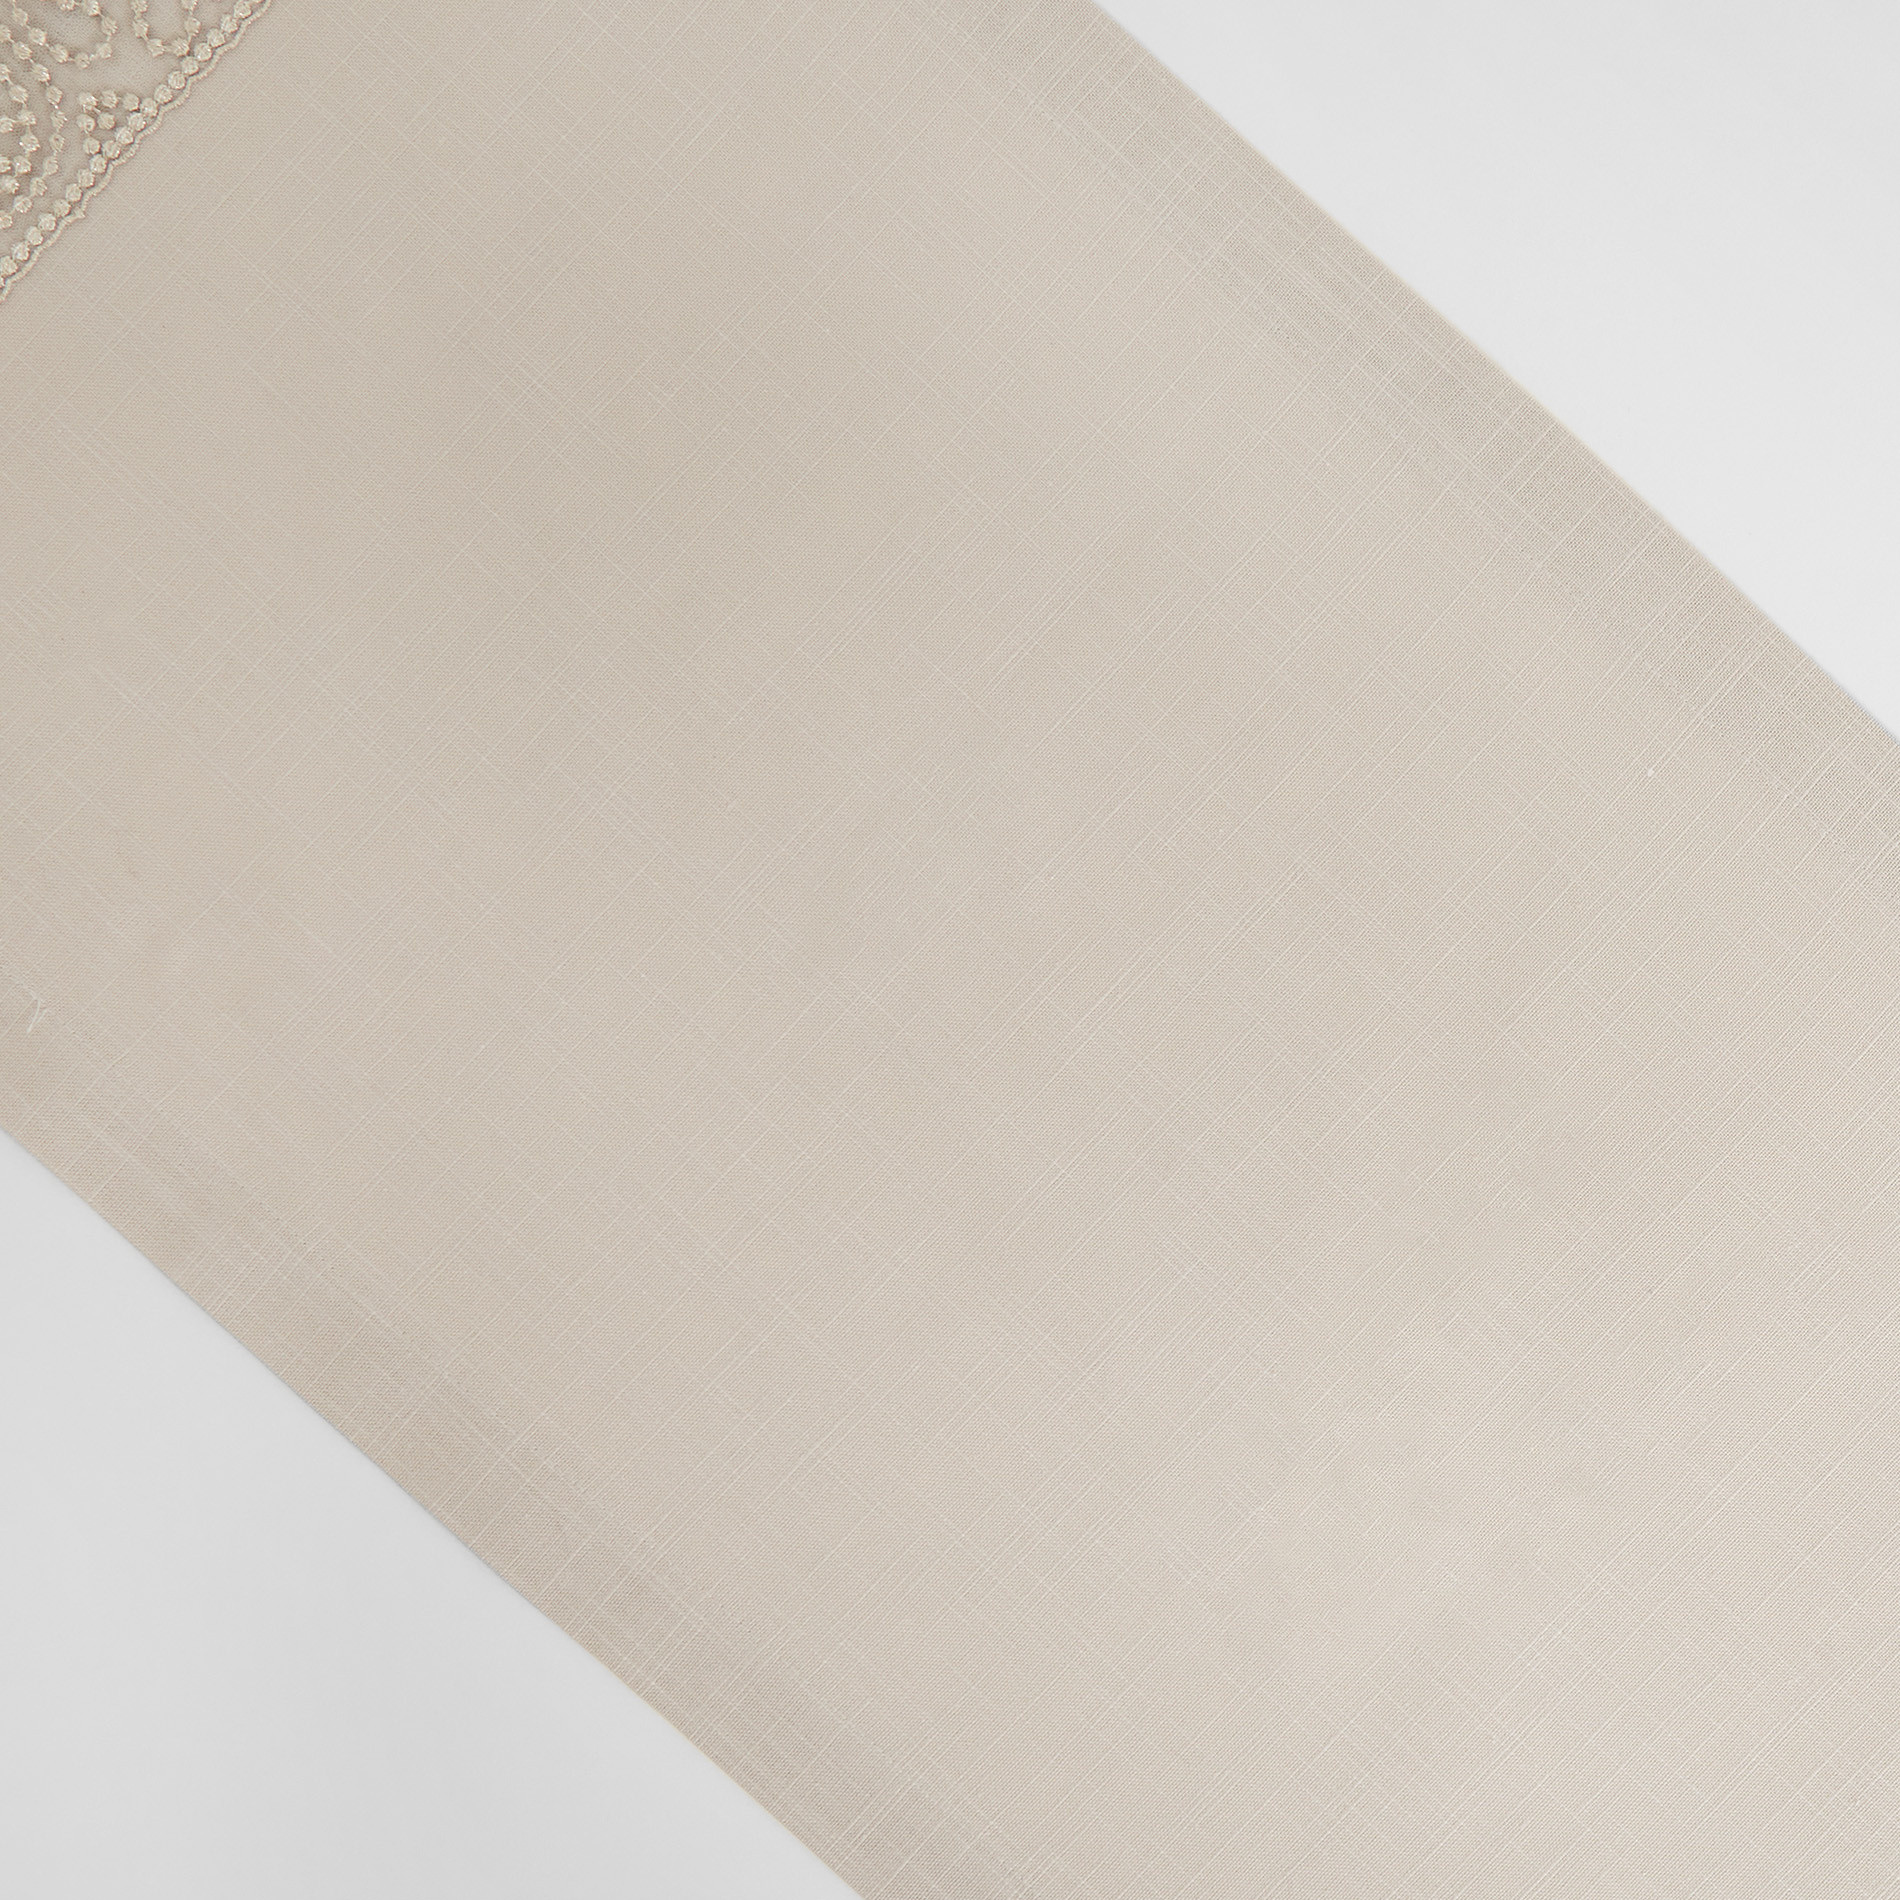 Runner puro cotone bordo in tulle e lurex, Beige chiaro, large image number 1